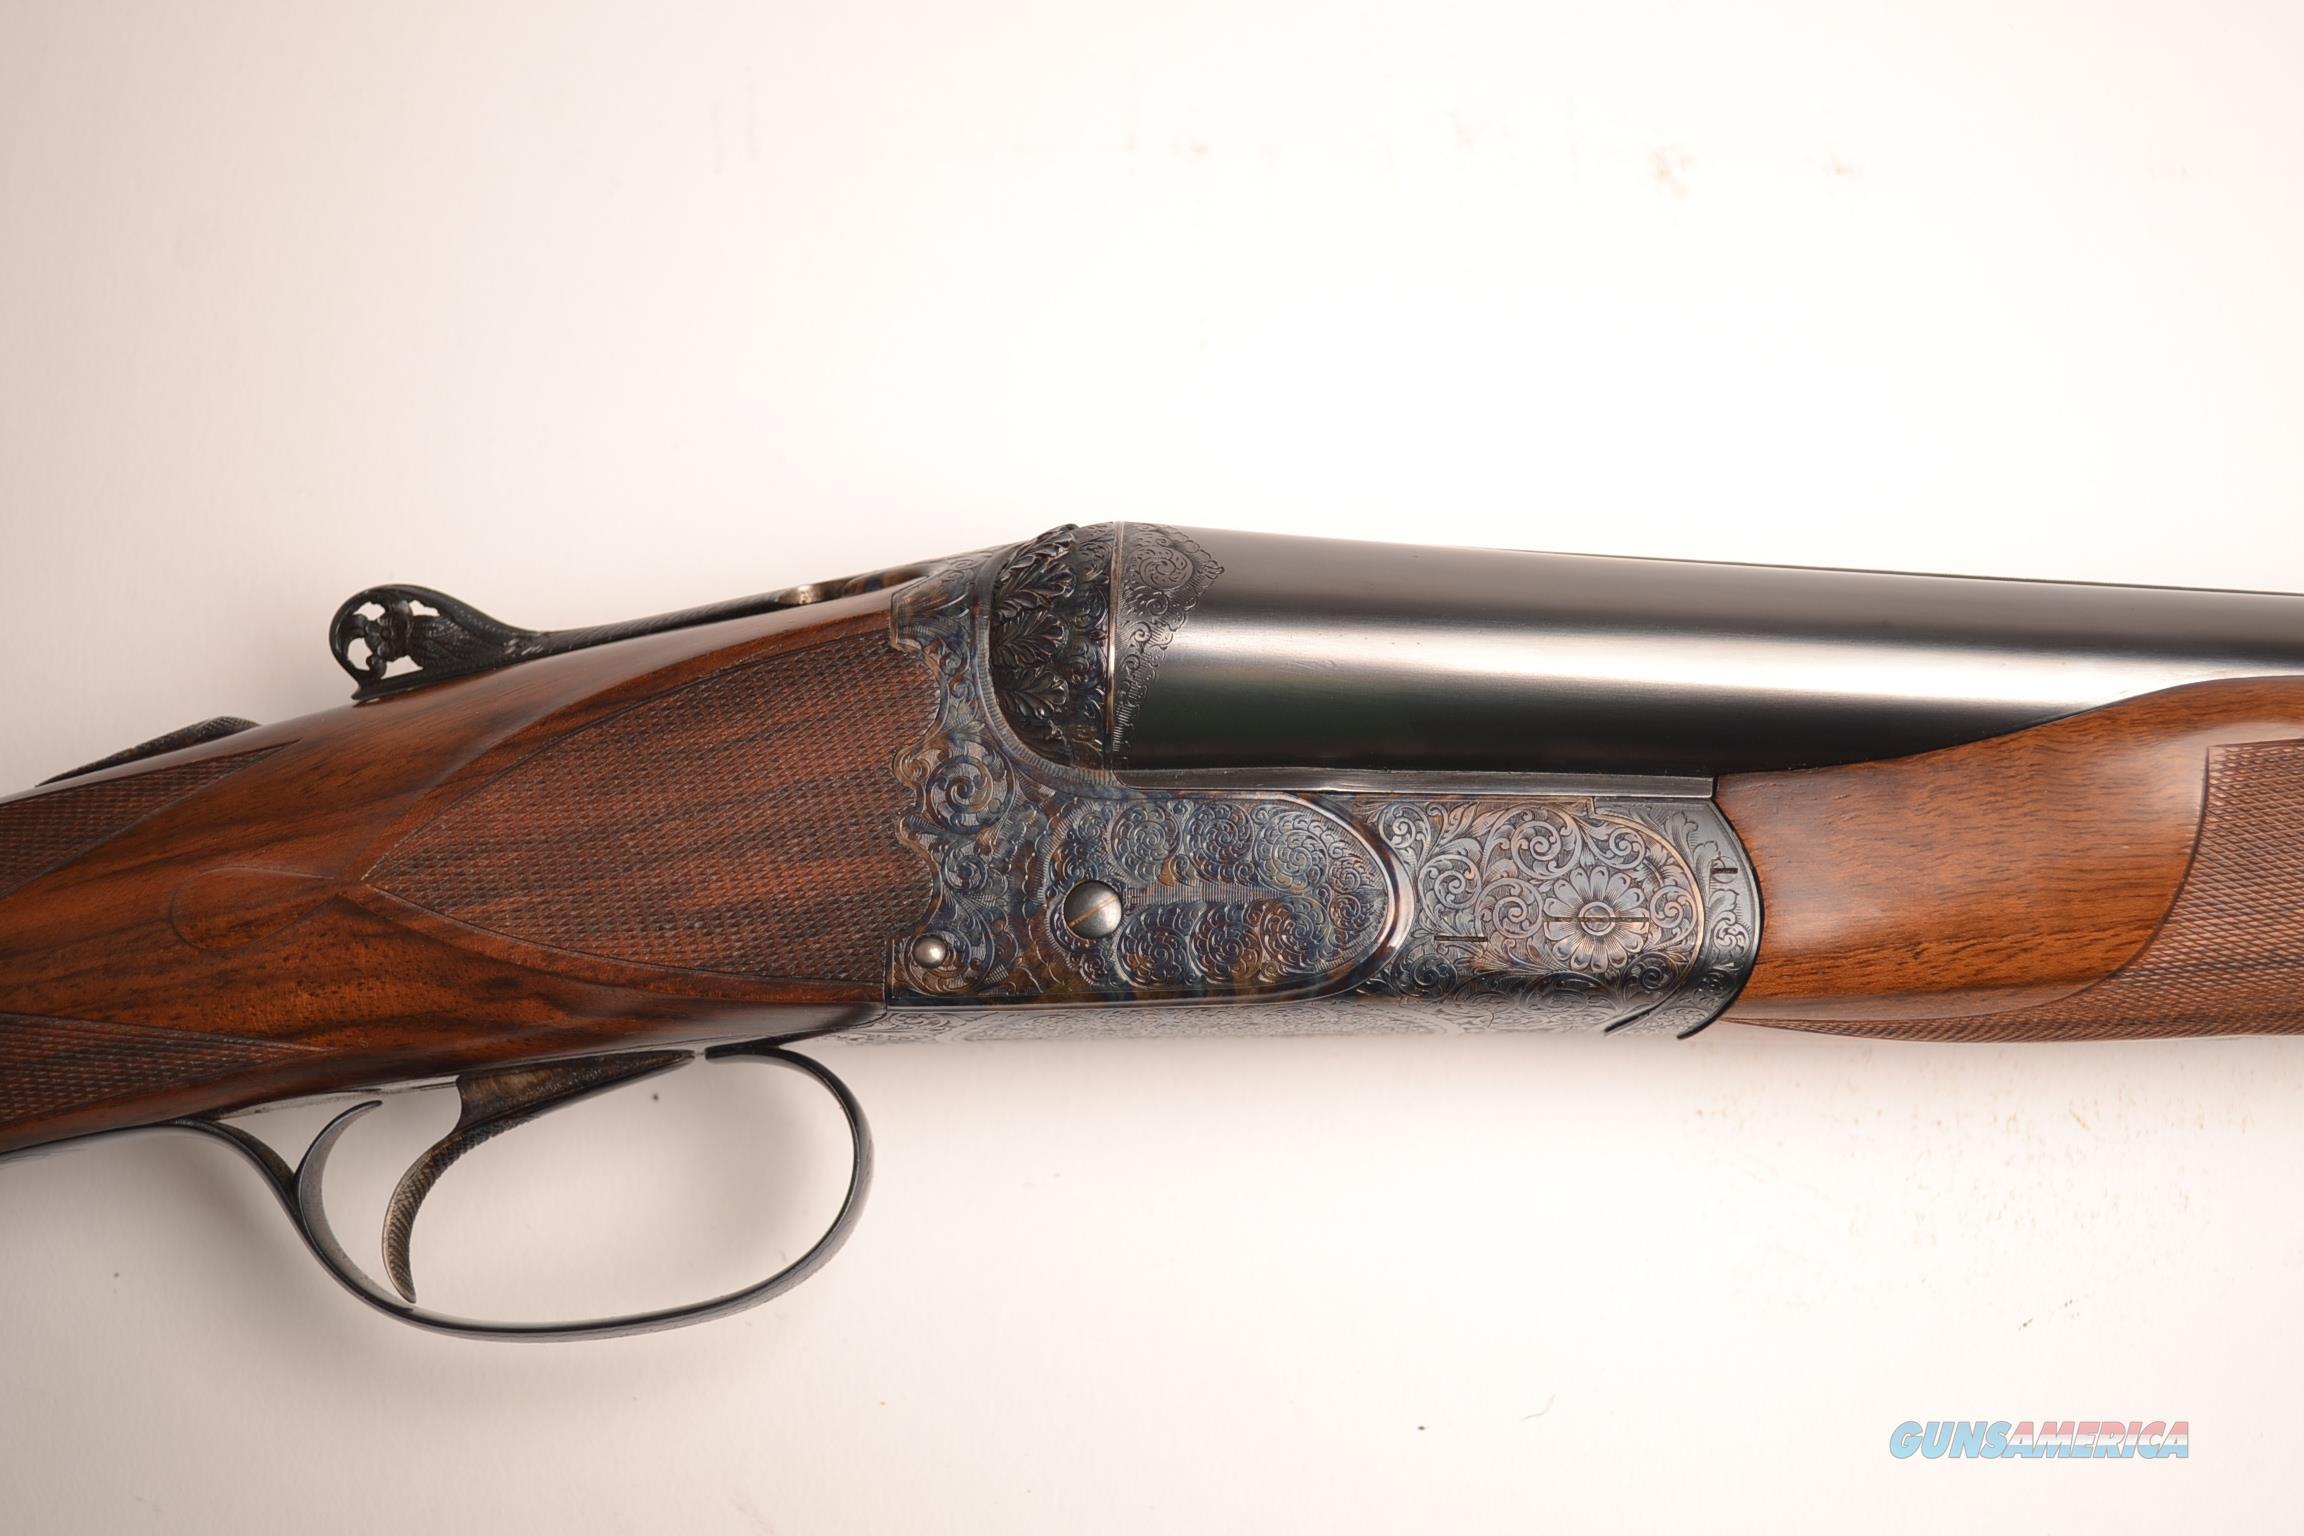 Rizzini - Extra Lusso  Guns > Shotguns > Rizzini Shotguns